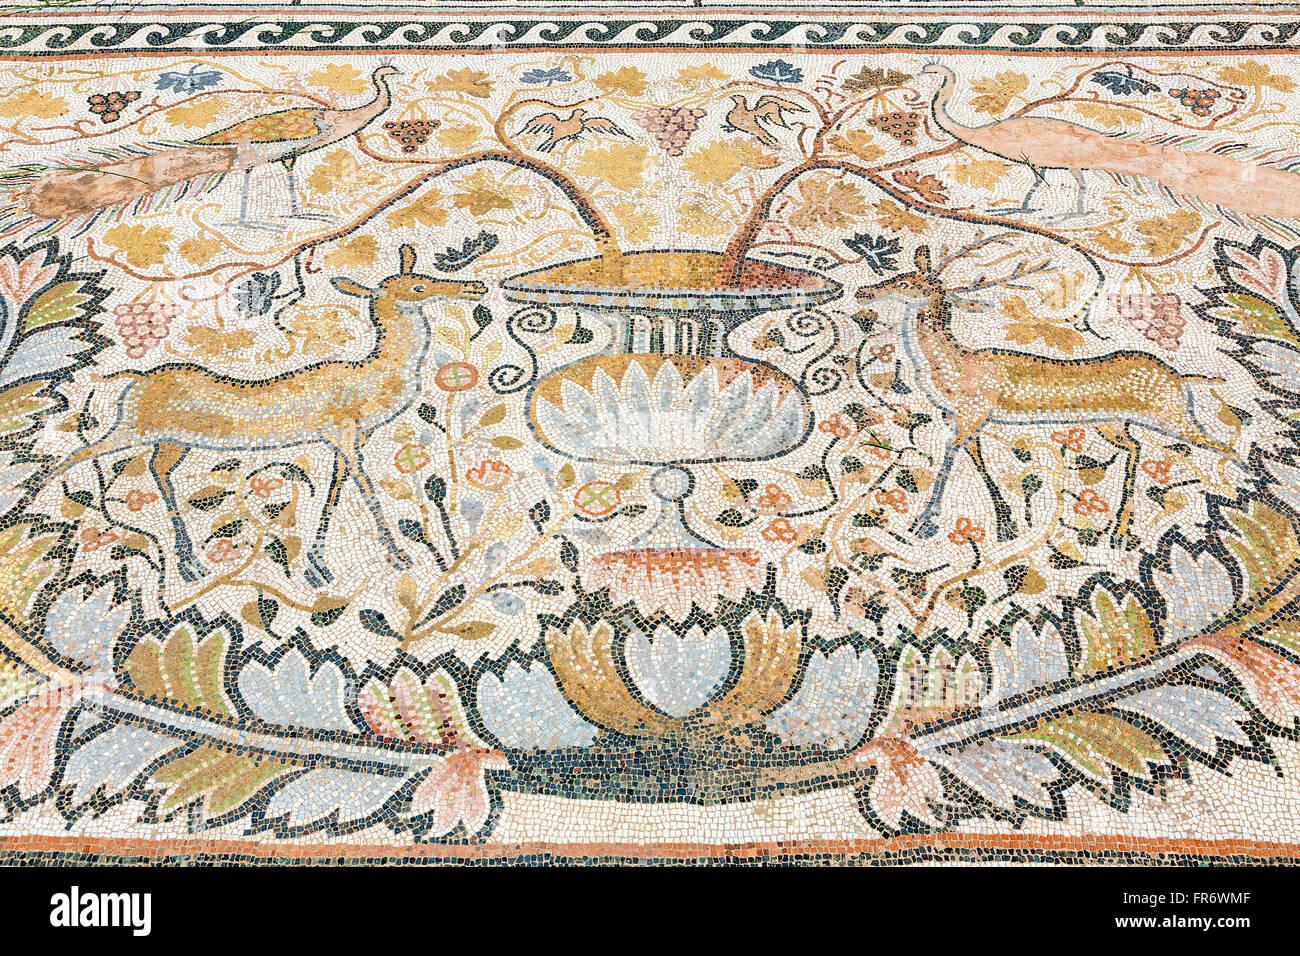 Republic of Macedonia, Bitola, the ruins of Heraclea Lyncestis - Stock Image